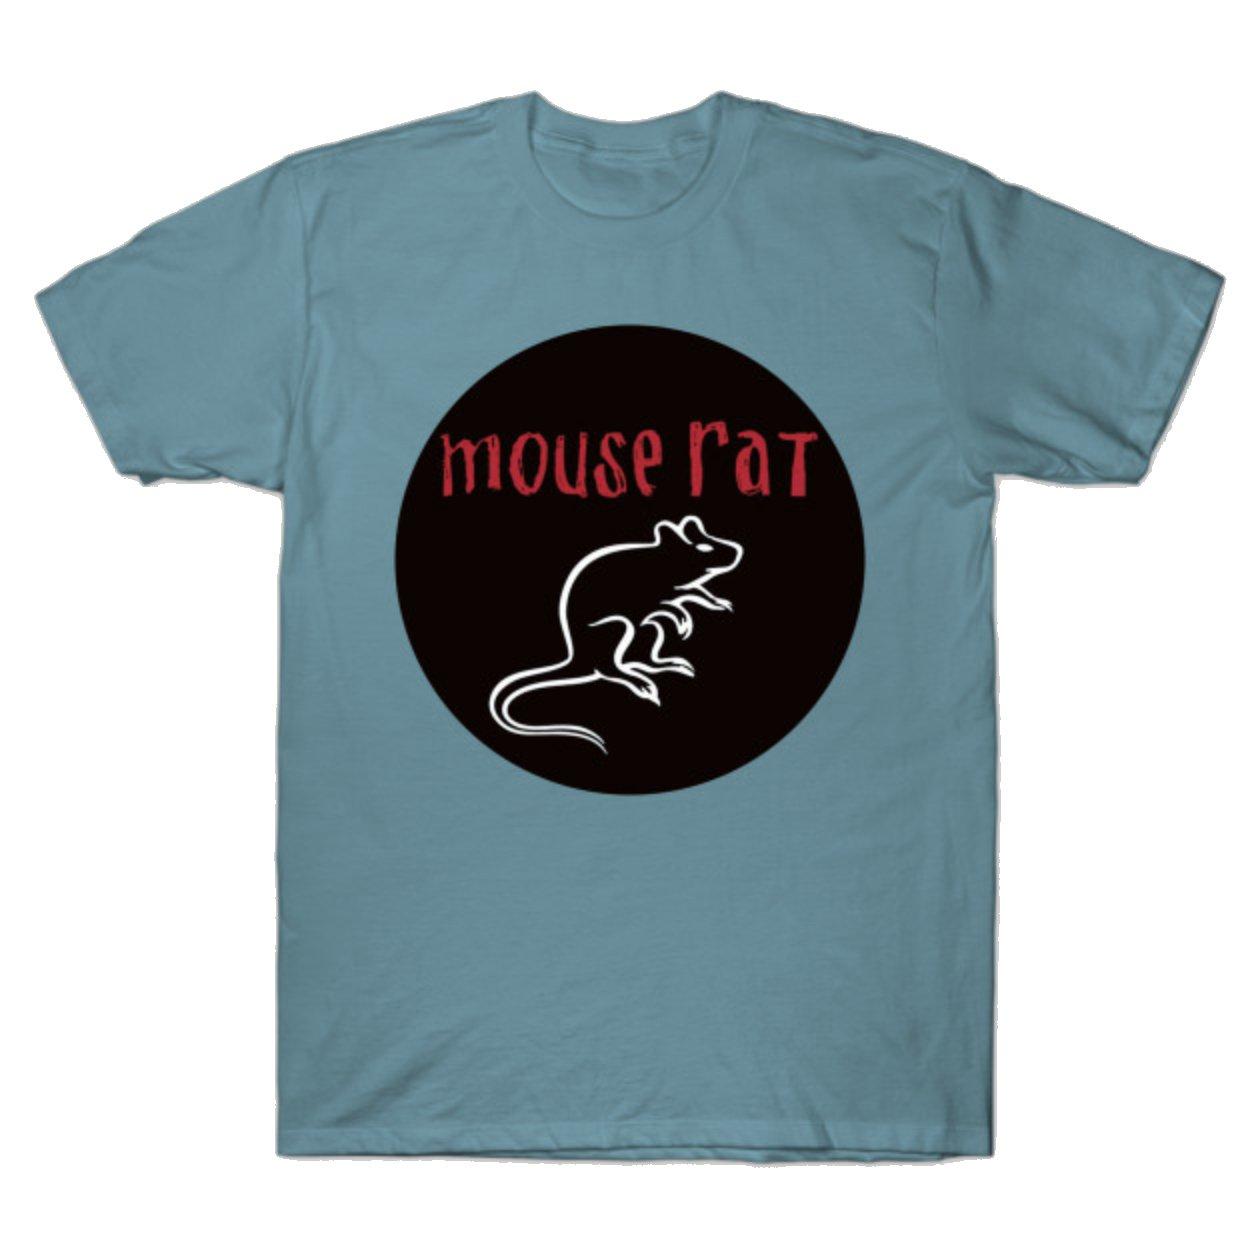 Guoheng Mouse Rat Funny Tshirt 4004